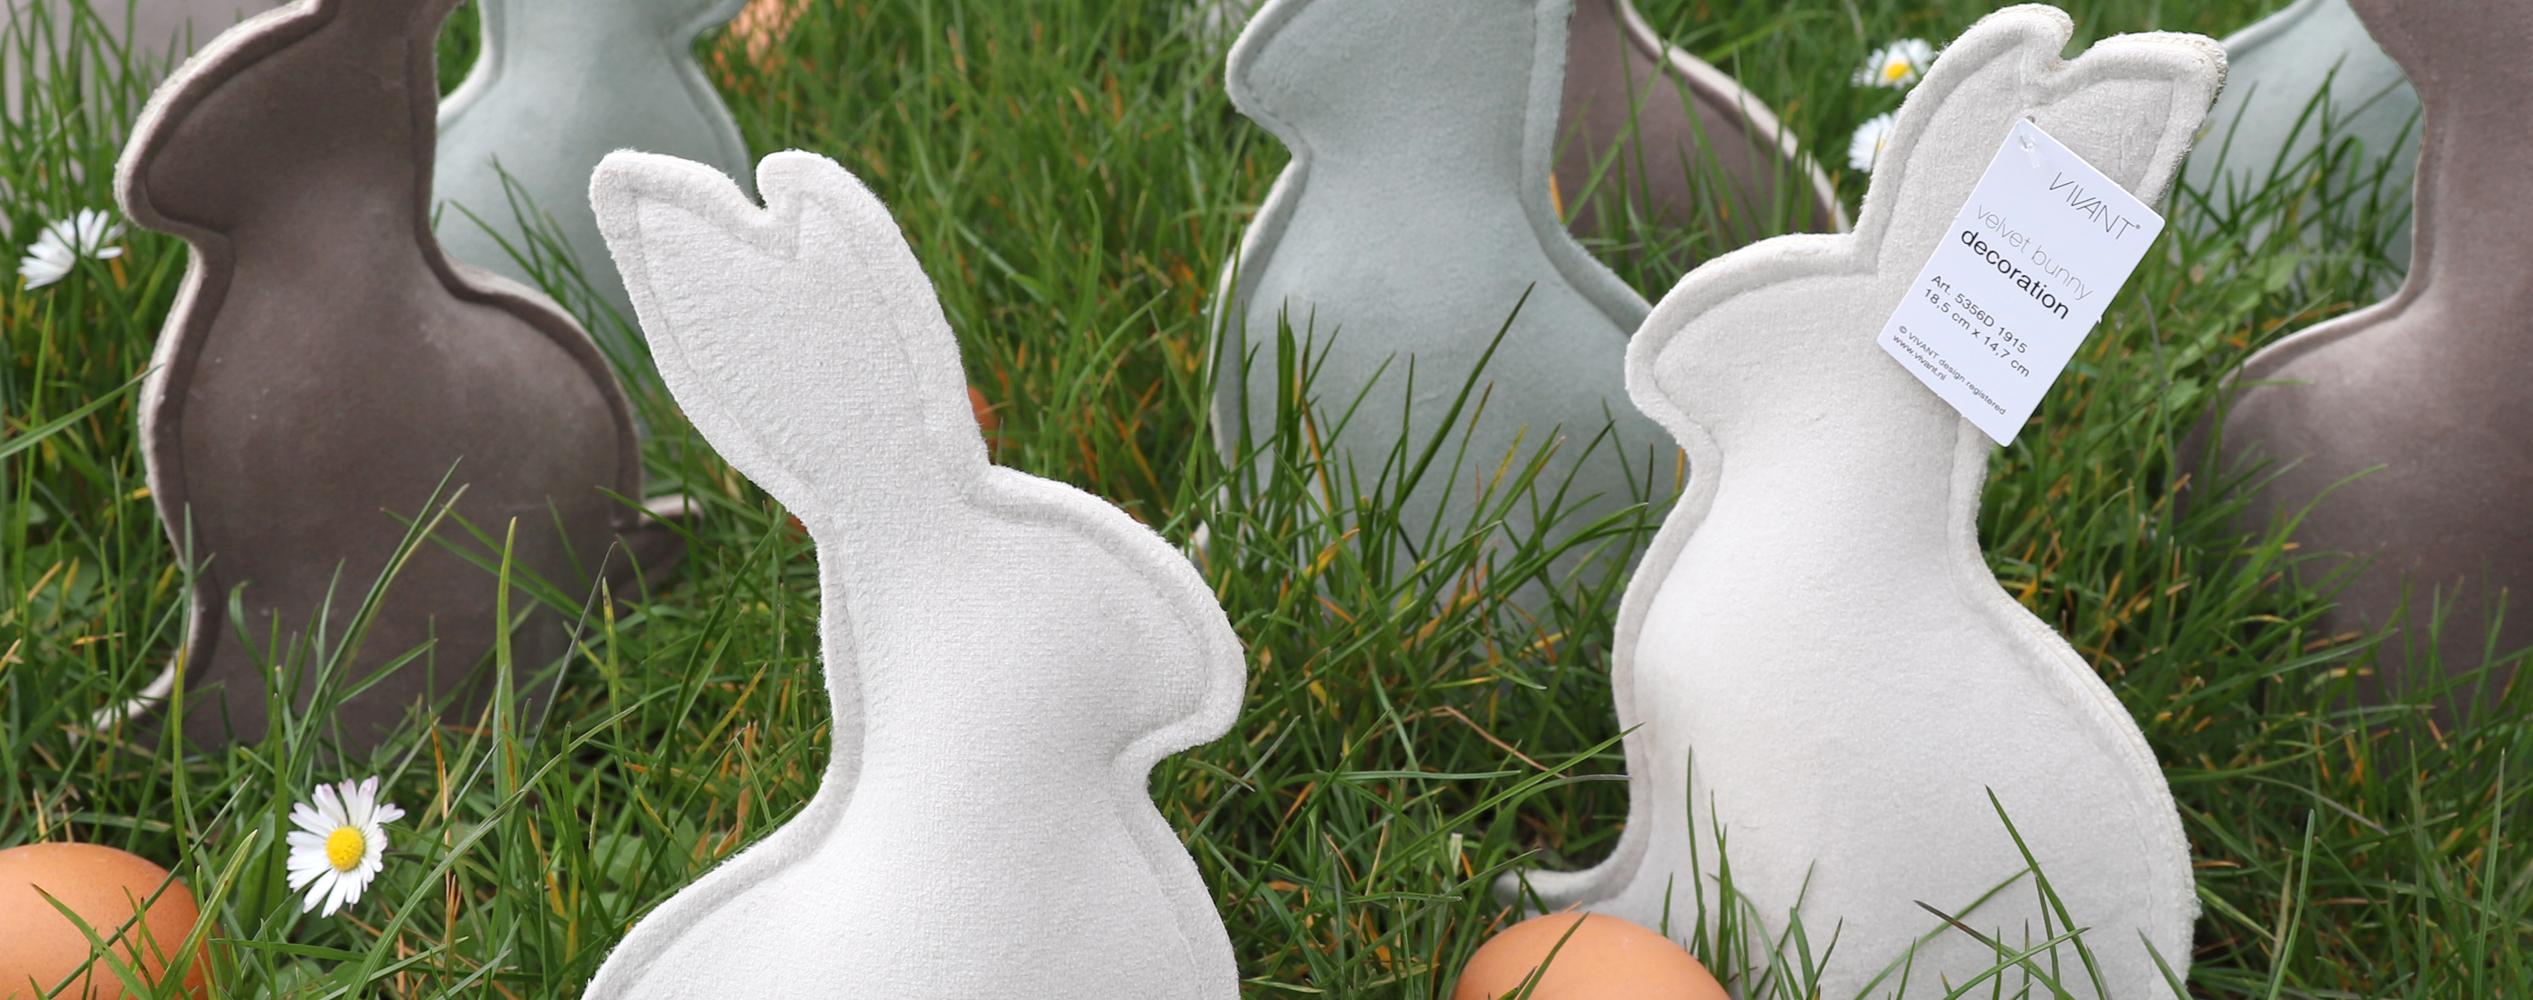 Velvet bunny sleeves en eierwarmers als paasdecoratie op tafel of etalage